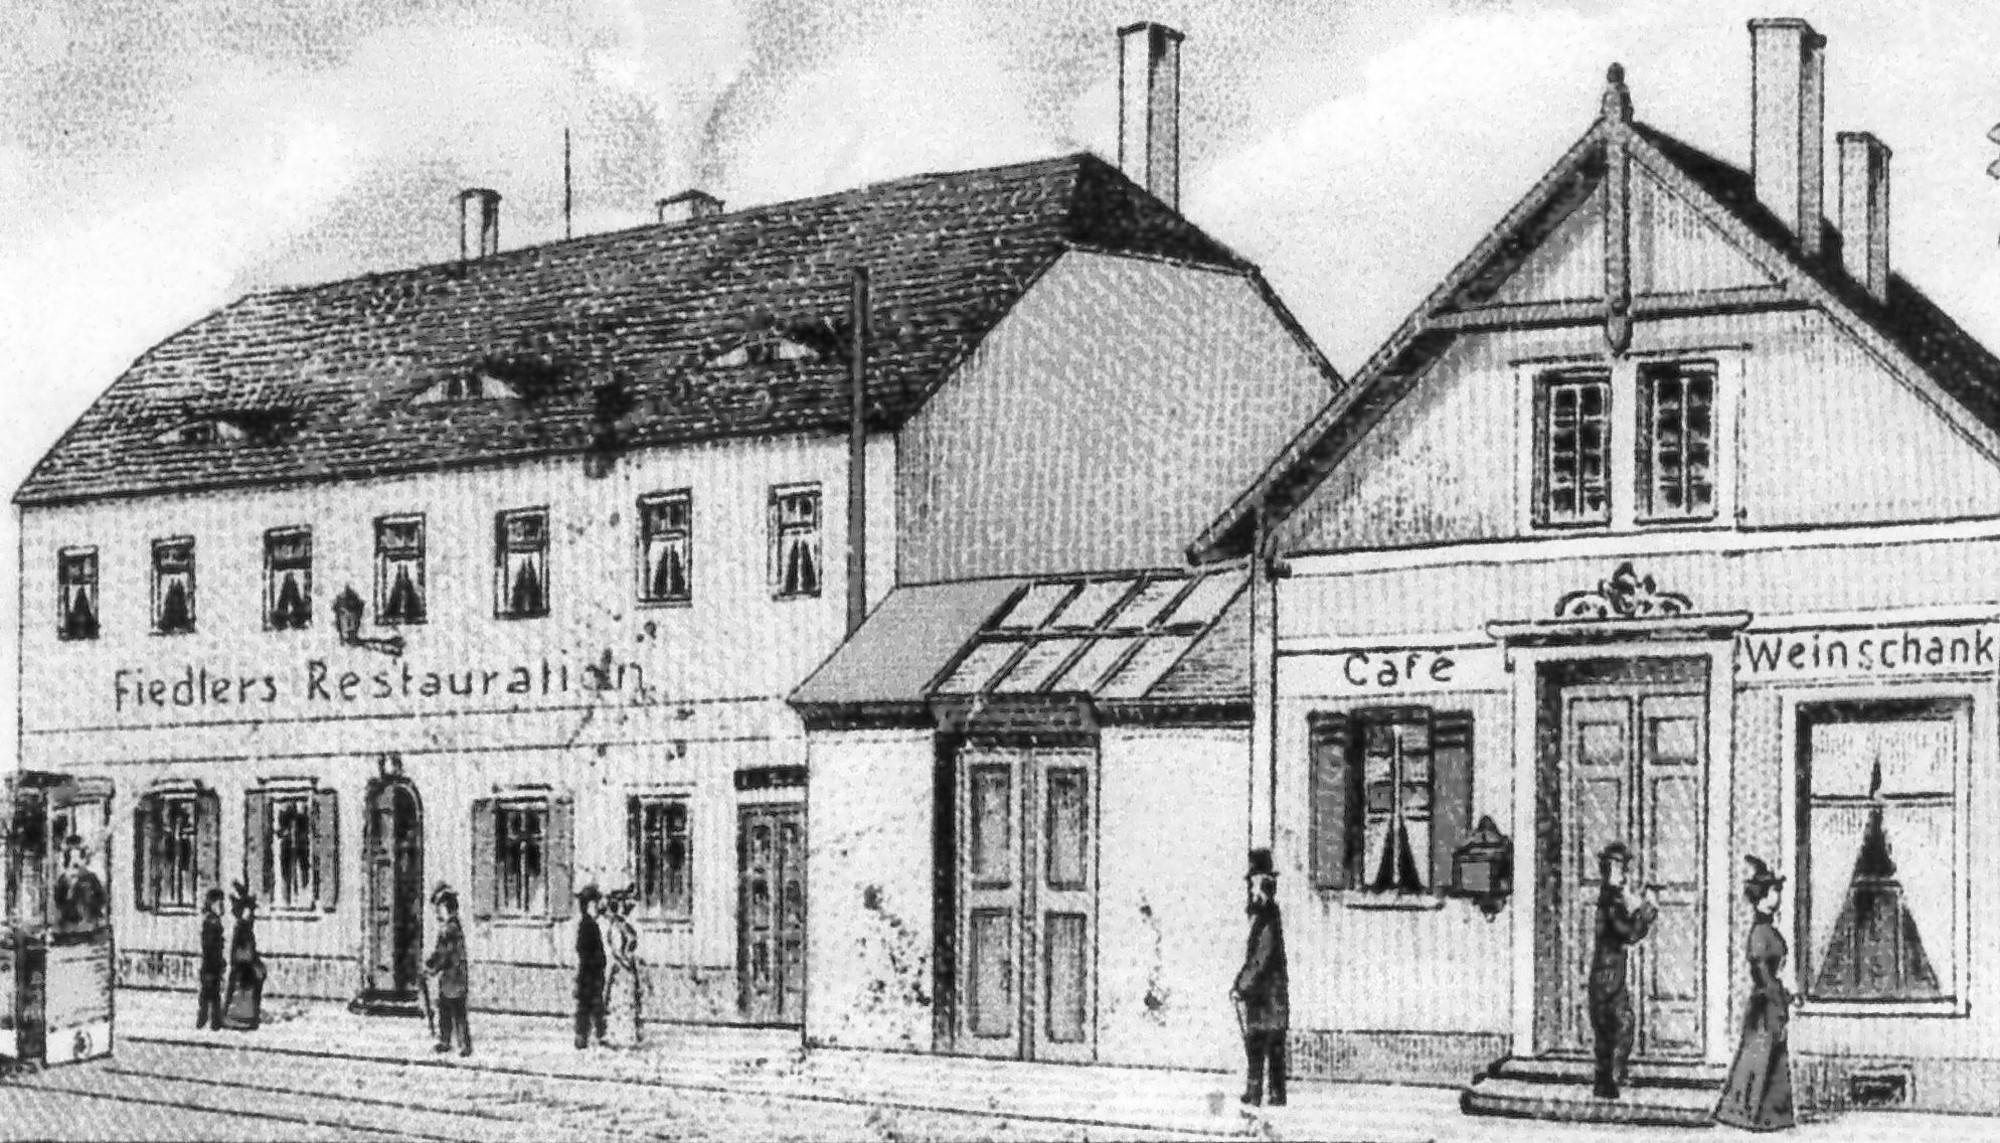 fiedlers restaurant